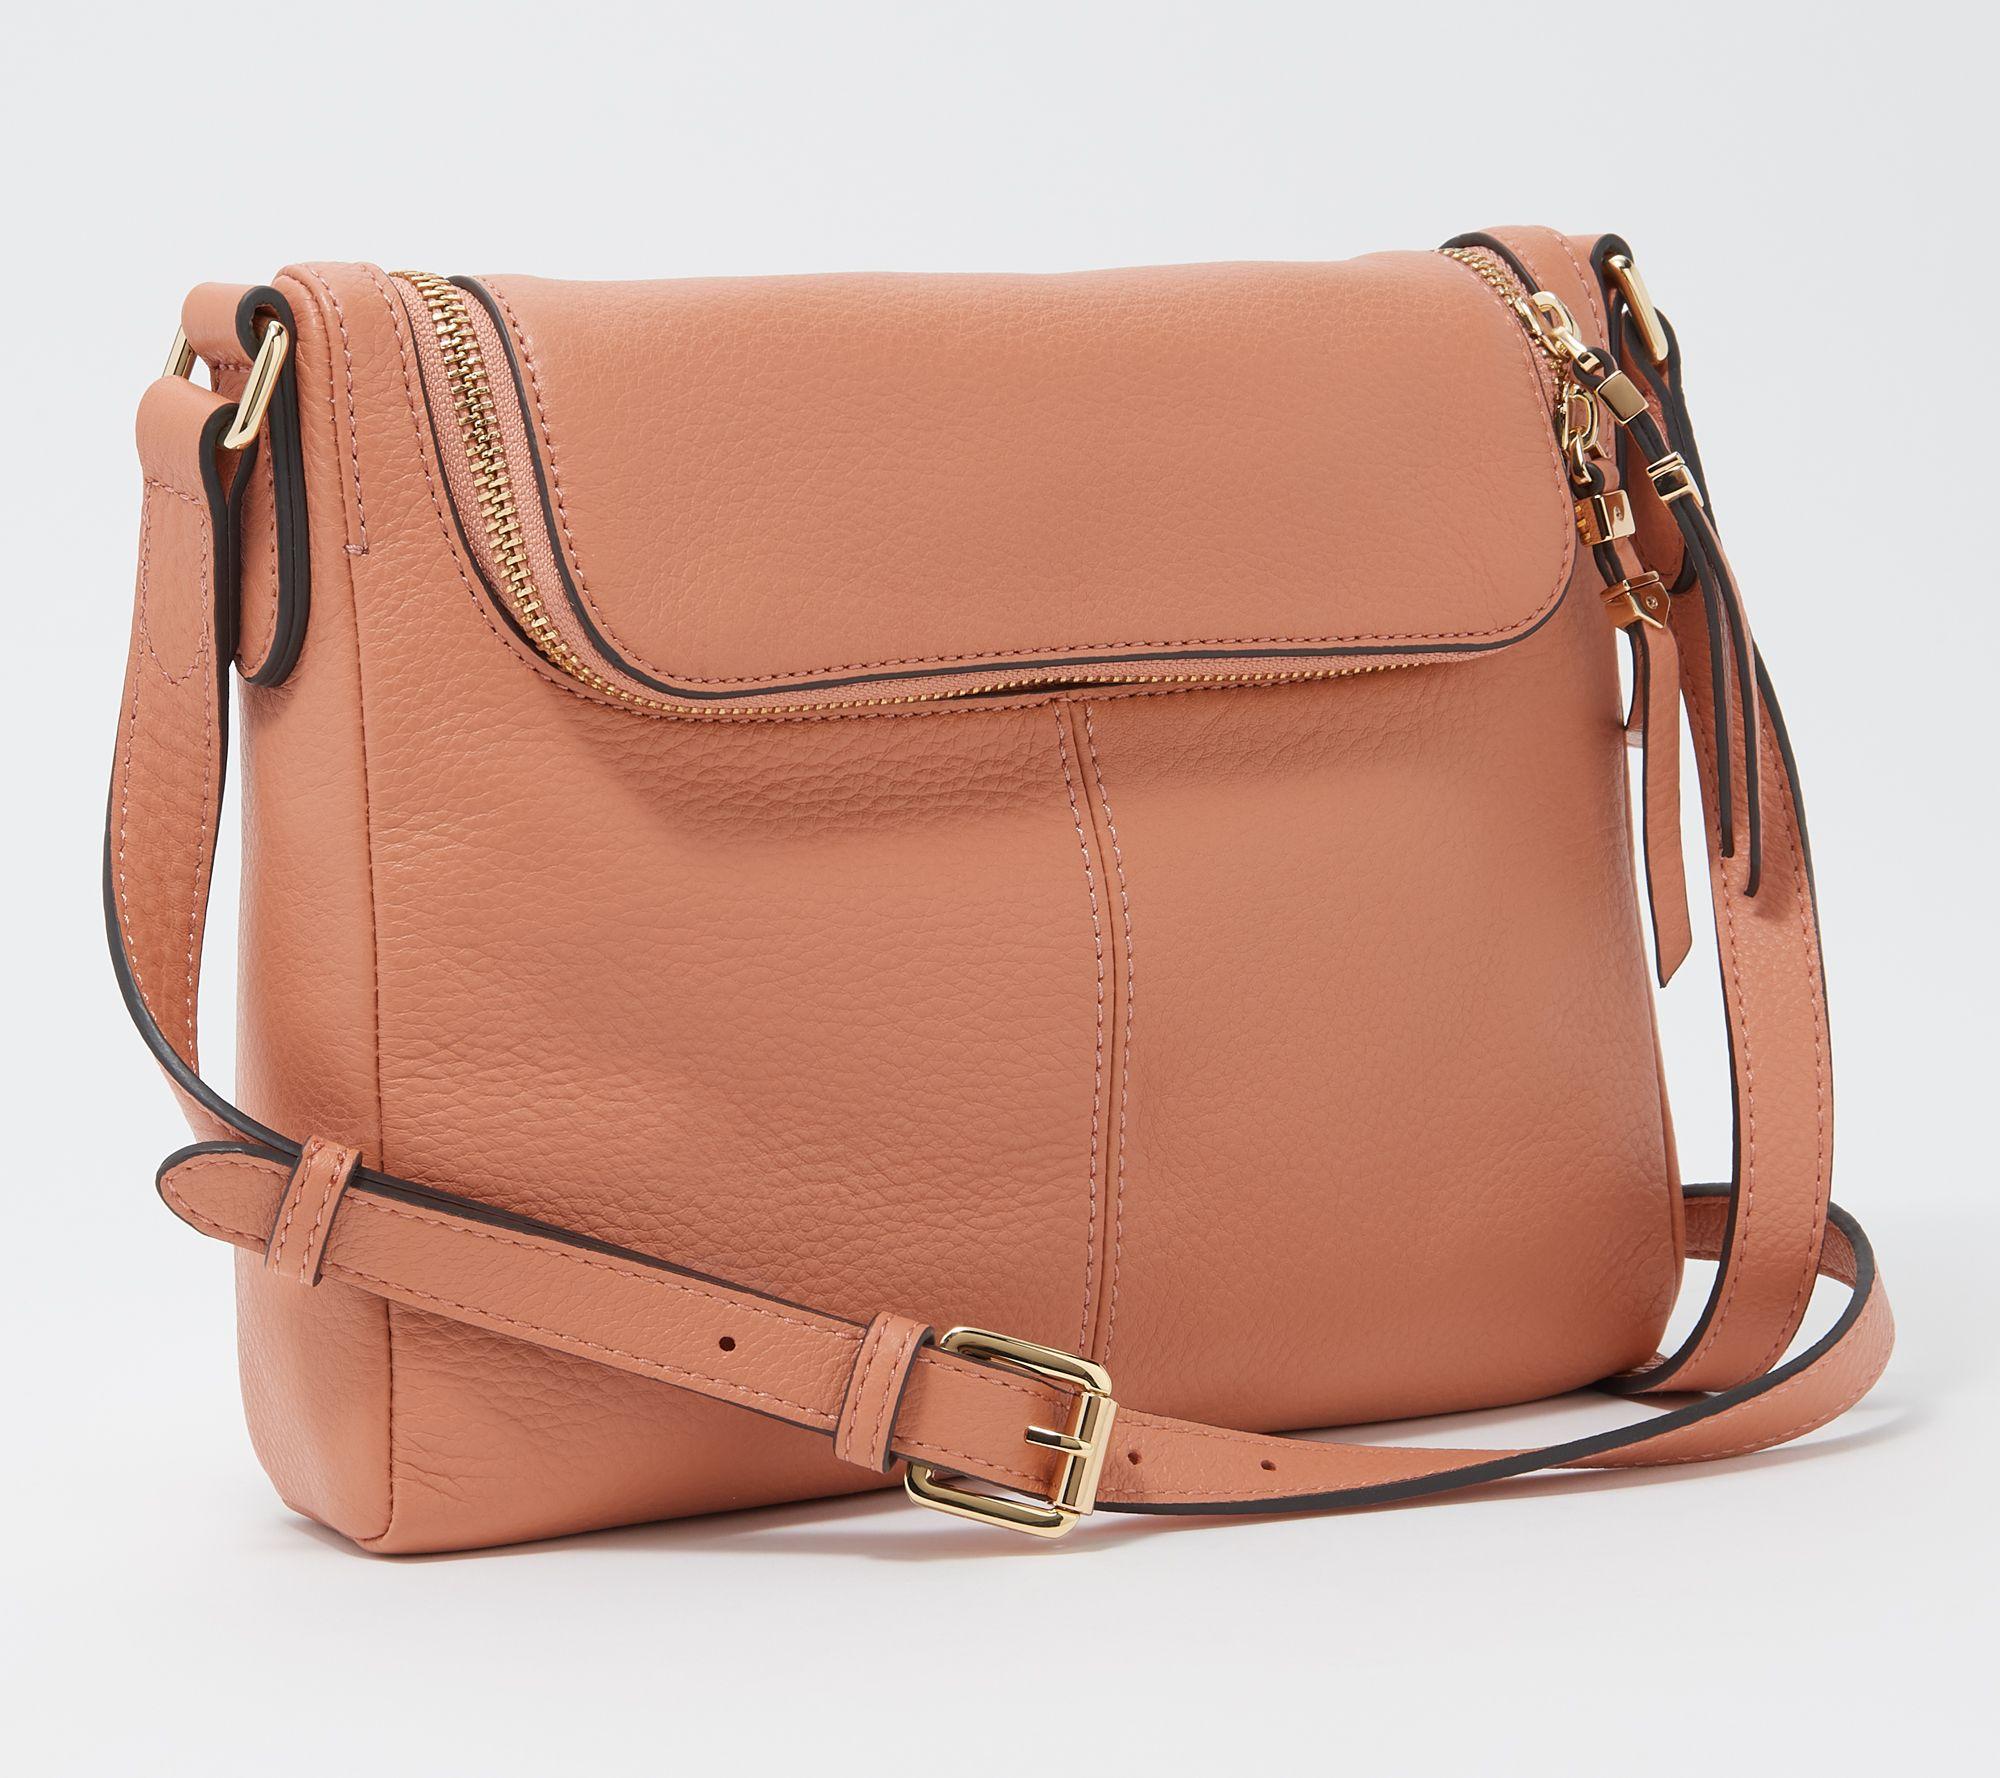 e044d90a14 Vince Camuto Leather Crossbody Bag - Tuli - Page 1 — QVC.com